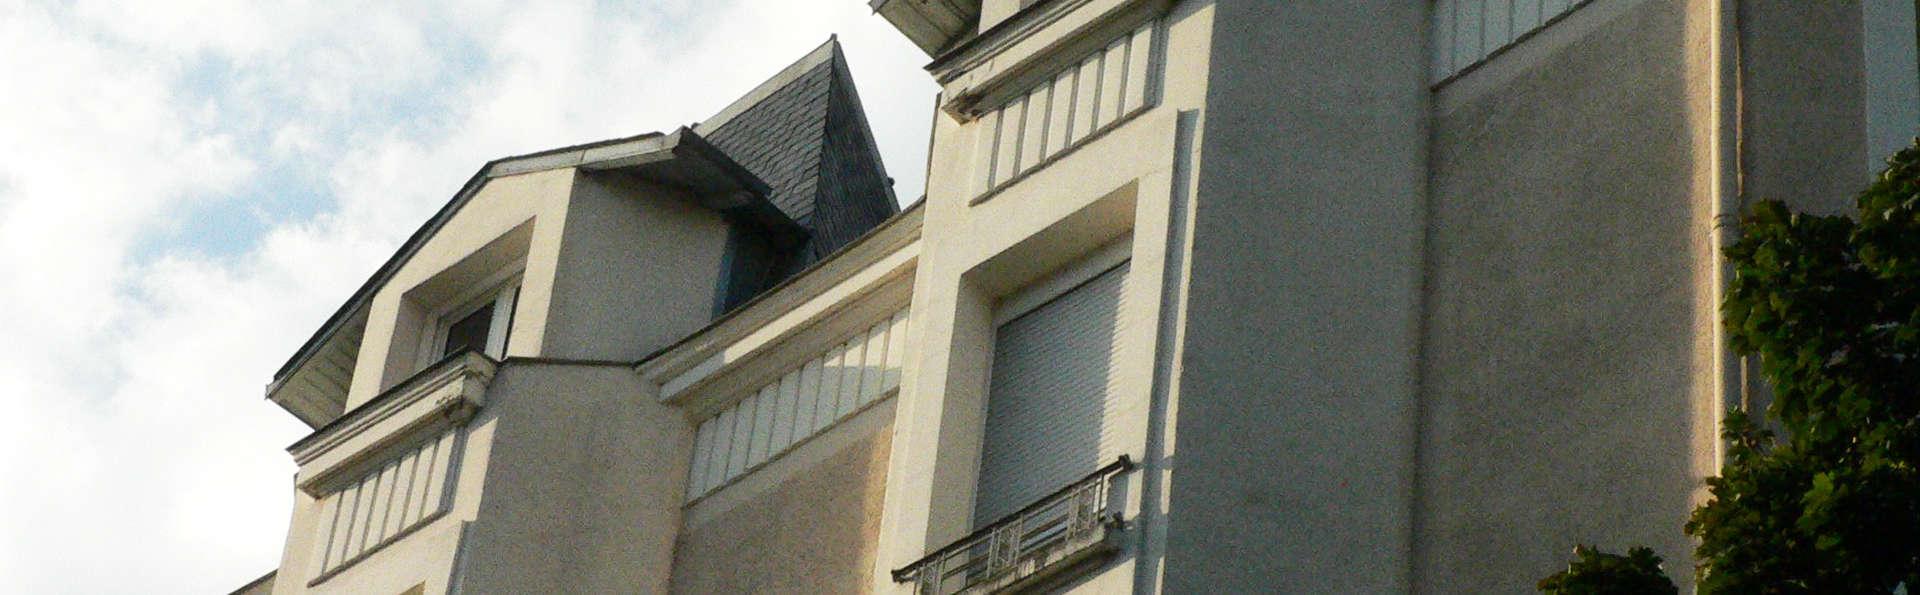 Central Hôtel Kyriad Vichy - EDIT_front.jpg